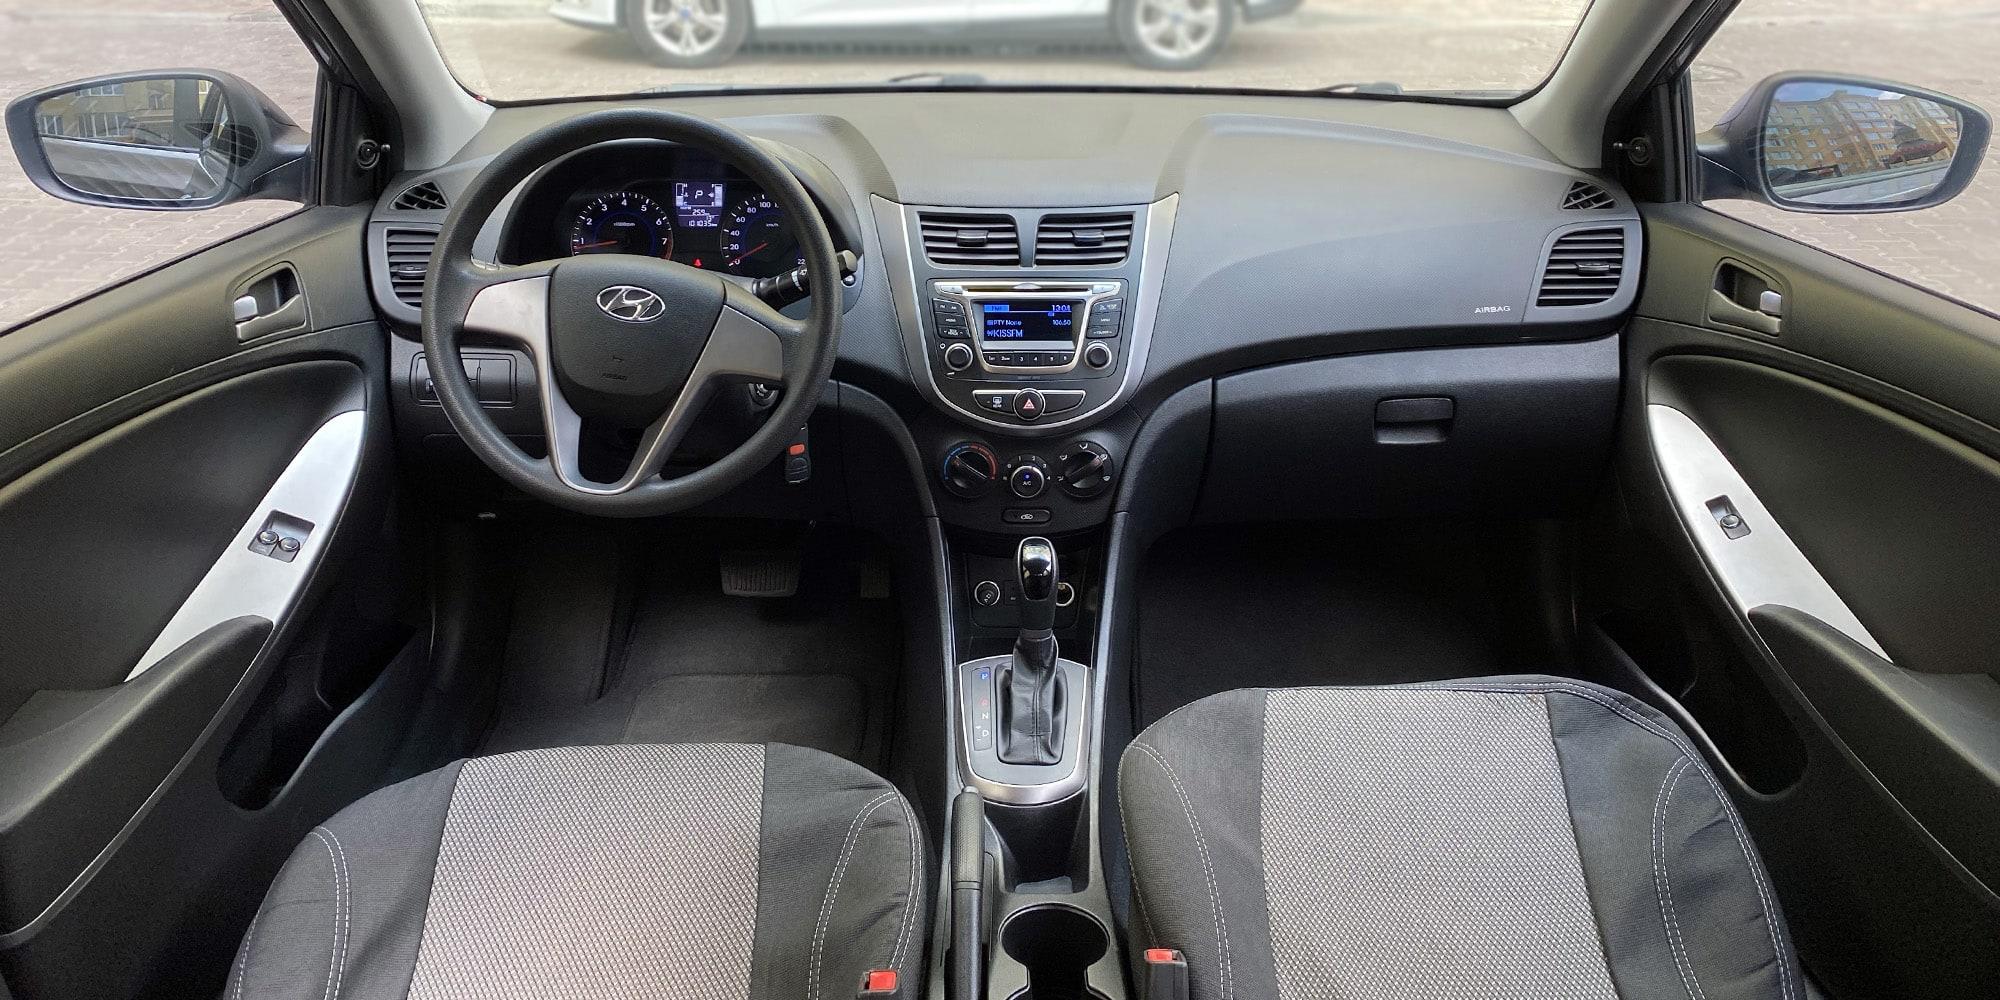 Hyundai Accent (Solaris) 2017 - TopRent прокат авто Киев | car hire KyivWhatsAppViberTelegramWhatsAppViberTelegramCAR BODY - sedantype-drive-fronticonsType-fuel-a95Type-conditioner-airFuel-consumptionSales_суперценаCAR BODY - hatchbacktype-drive-frontType-fuel-a95Fuel-consumptionSales_суперценаCAR BODY - sedantype-drive-frontType-fuel-a95Fuel-consumptionSales_новинкаCAR BODY - sedantype-drive-frontType-fuel-a95Fuel-consumptionCAR BODY - sedantype-drive-frontType-fuel-dieselFuel-consumptionTopRent_Phone_oldTopRent_Icon_FaceBookTopRent_Icon_Instagram